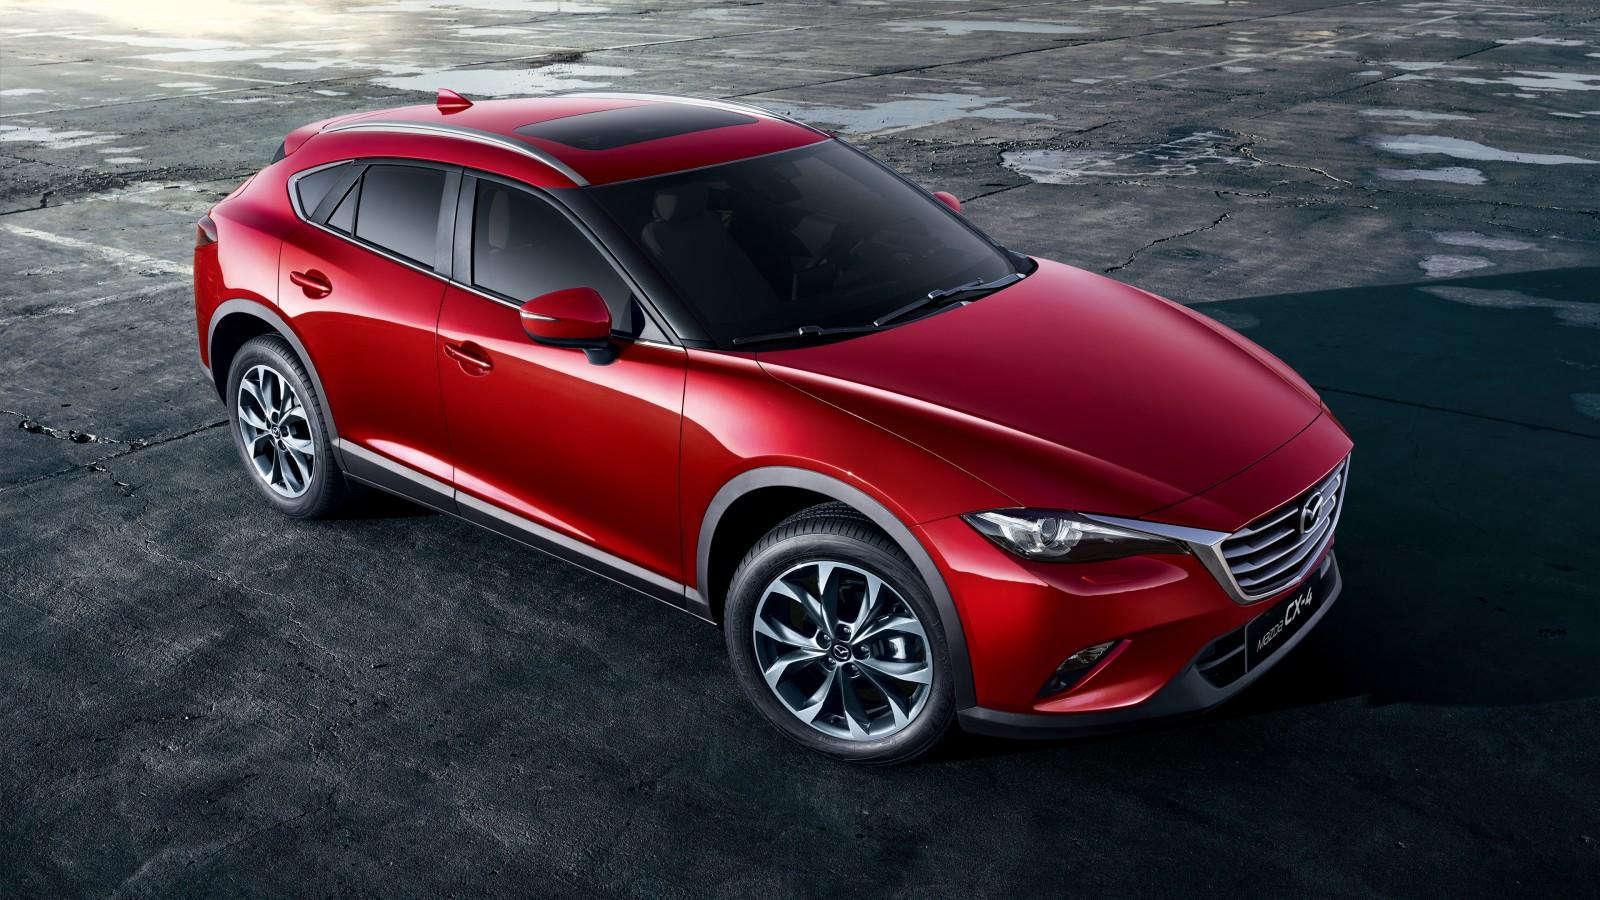 2017 Mazda CX 4 4K Wallpaper | HD Car Wallpapers